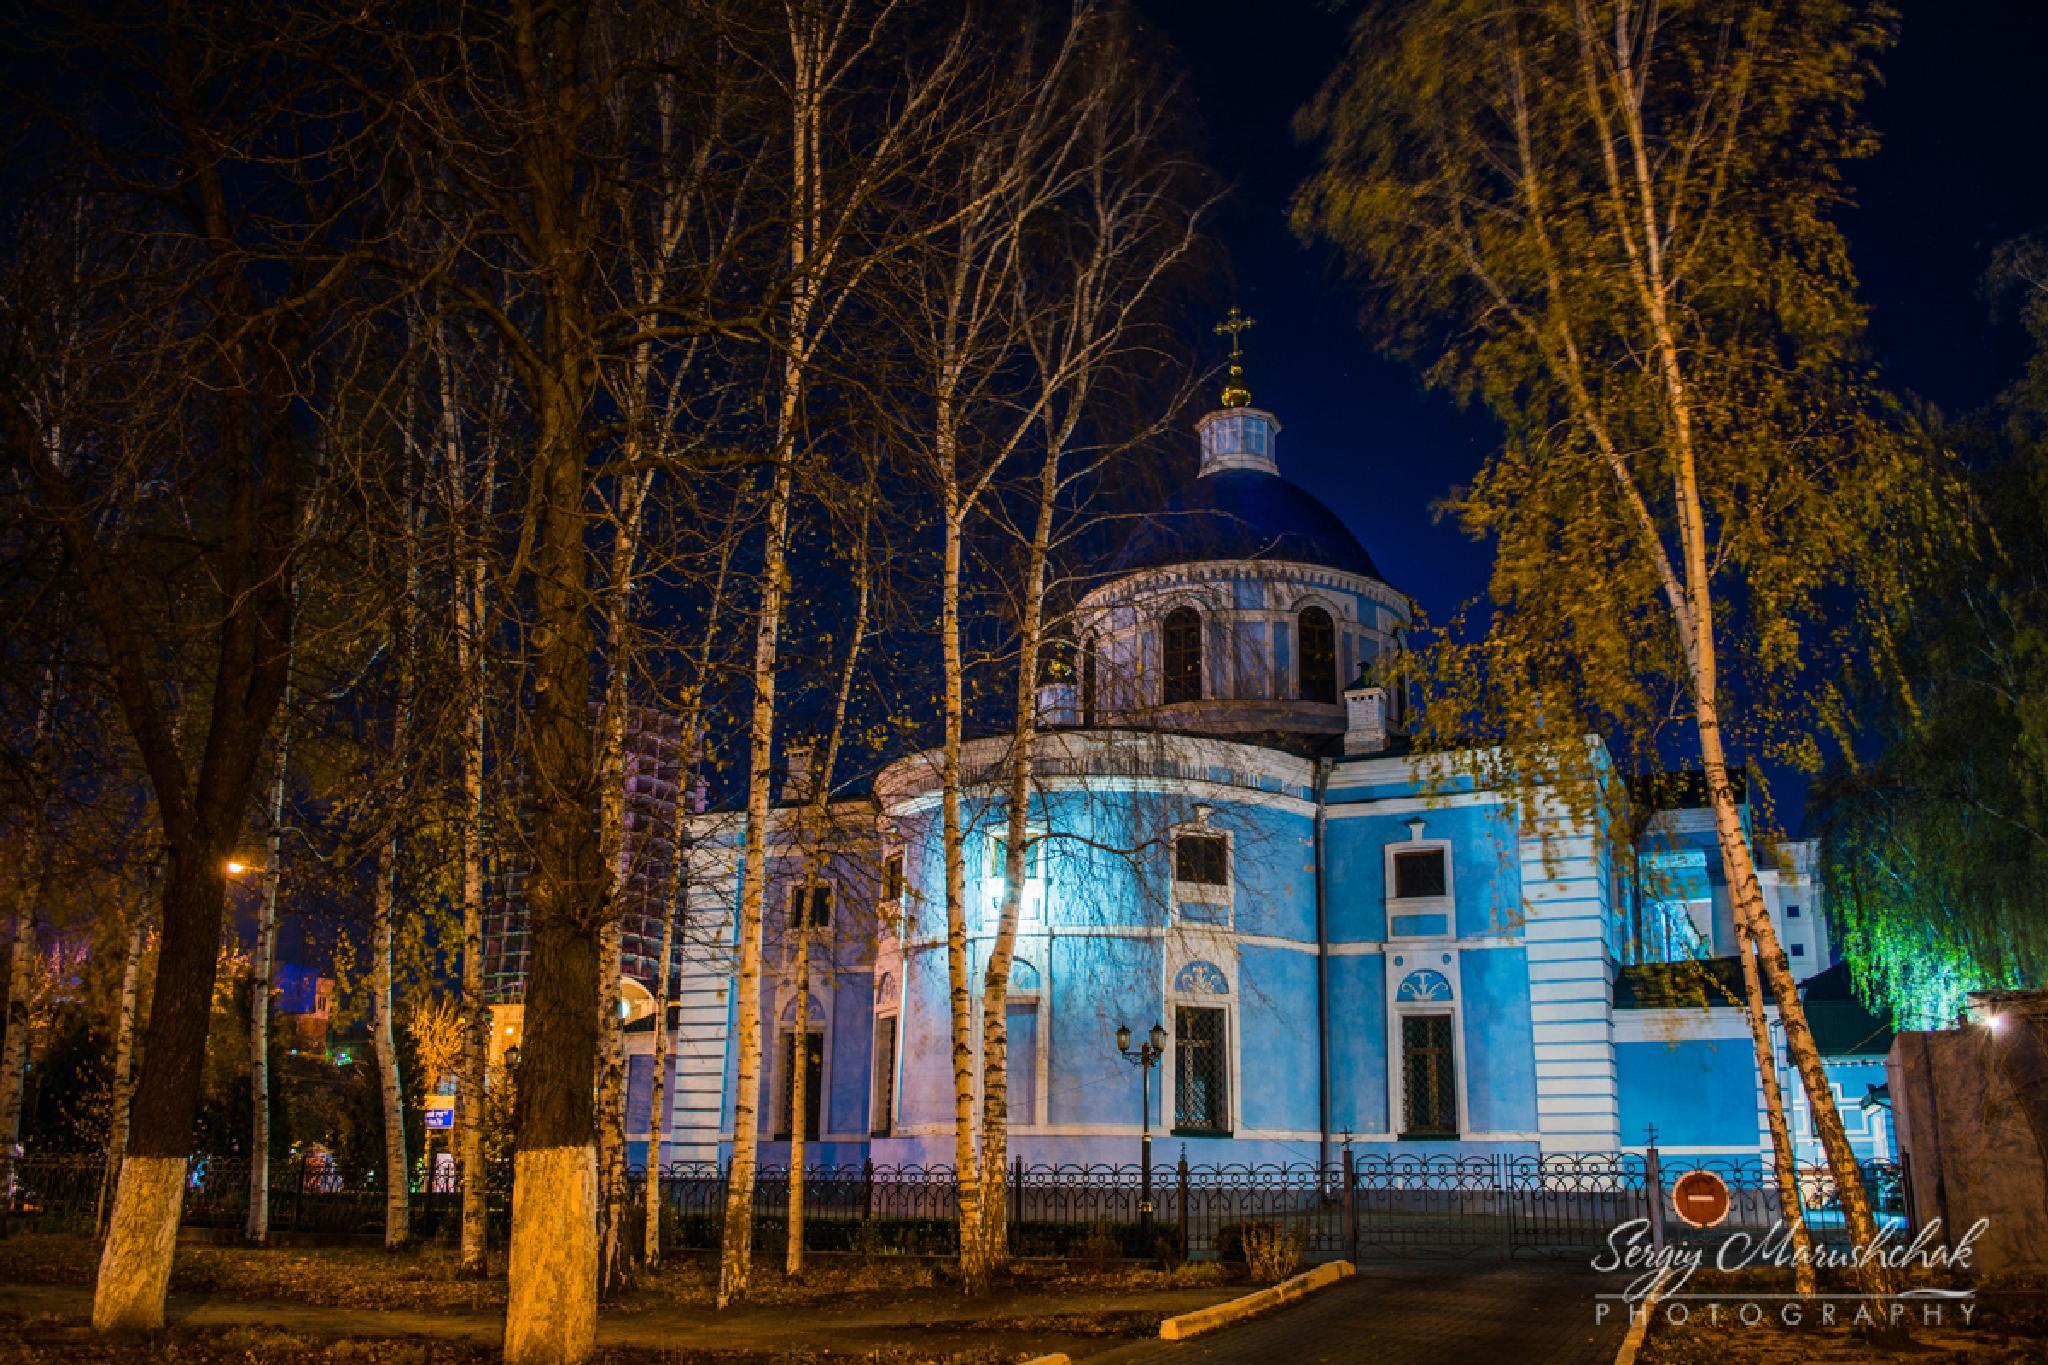 Собор осінньої ночі / Cathedral autumn nights by artmars07